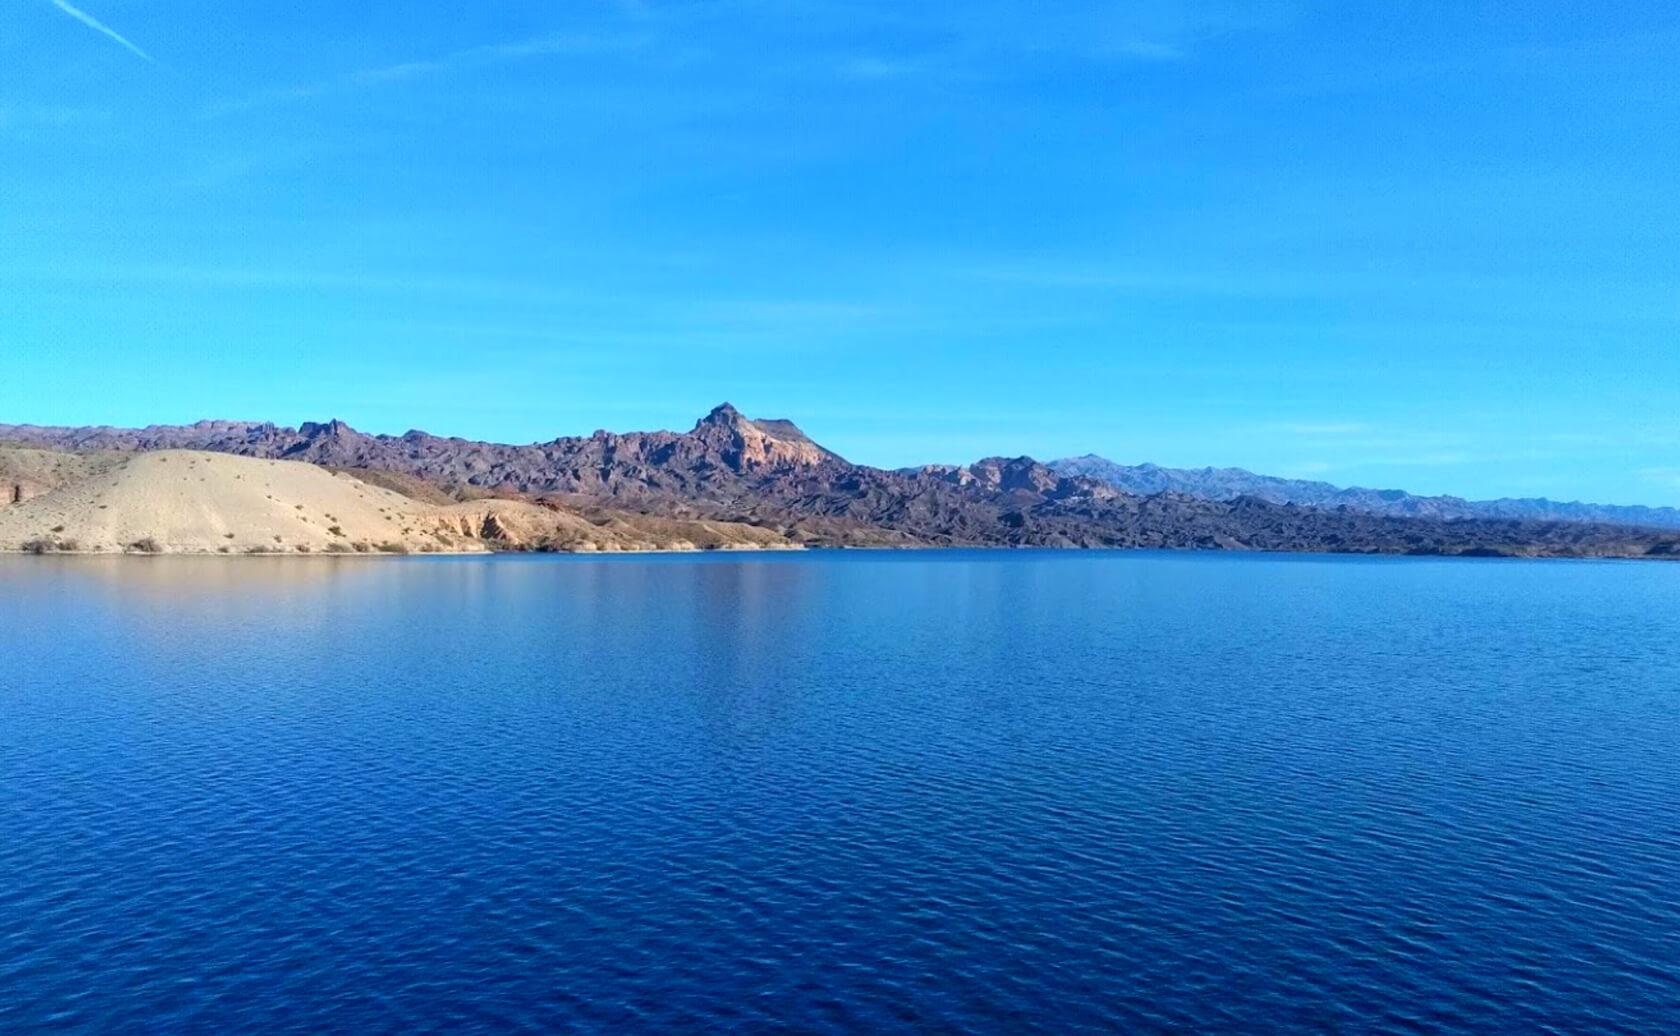 Mohave-Lake-Fishing-Guide-Report-Arizona-02